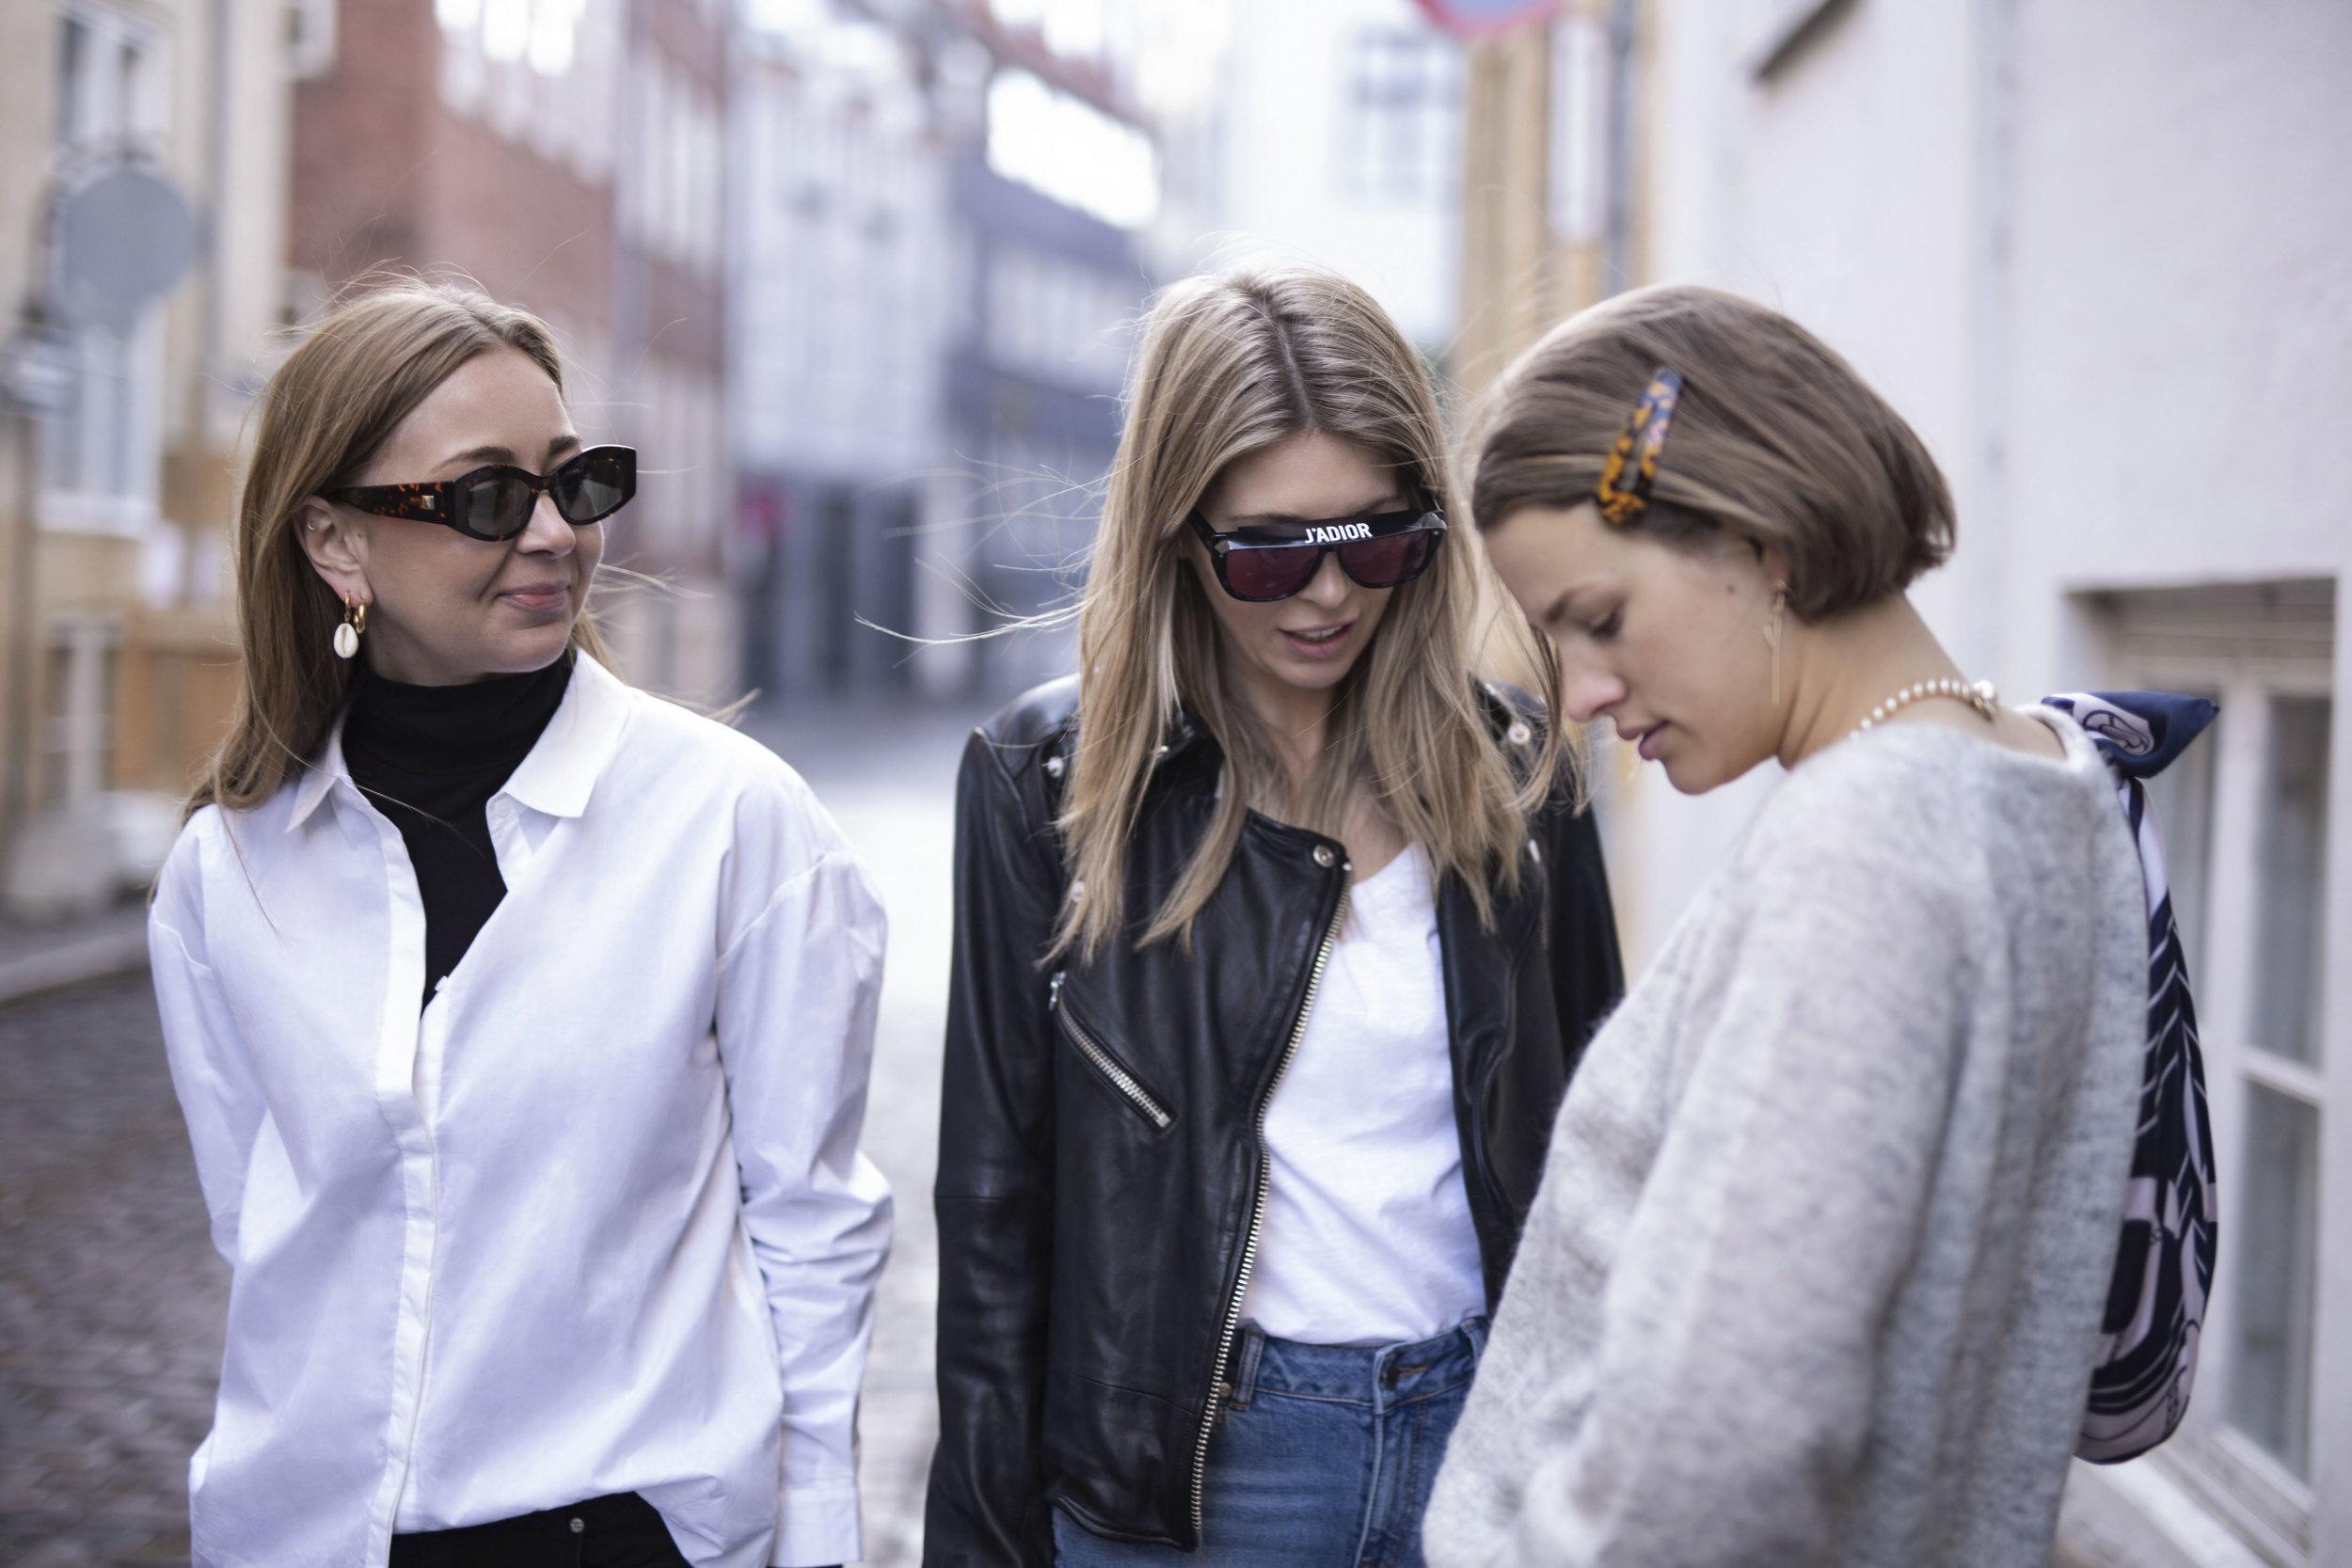 Katrine Krog, Cathrine Marie and Julie Blichfeld on the streets of Copenhagen wearing Denim Hunter clothes